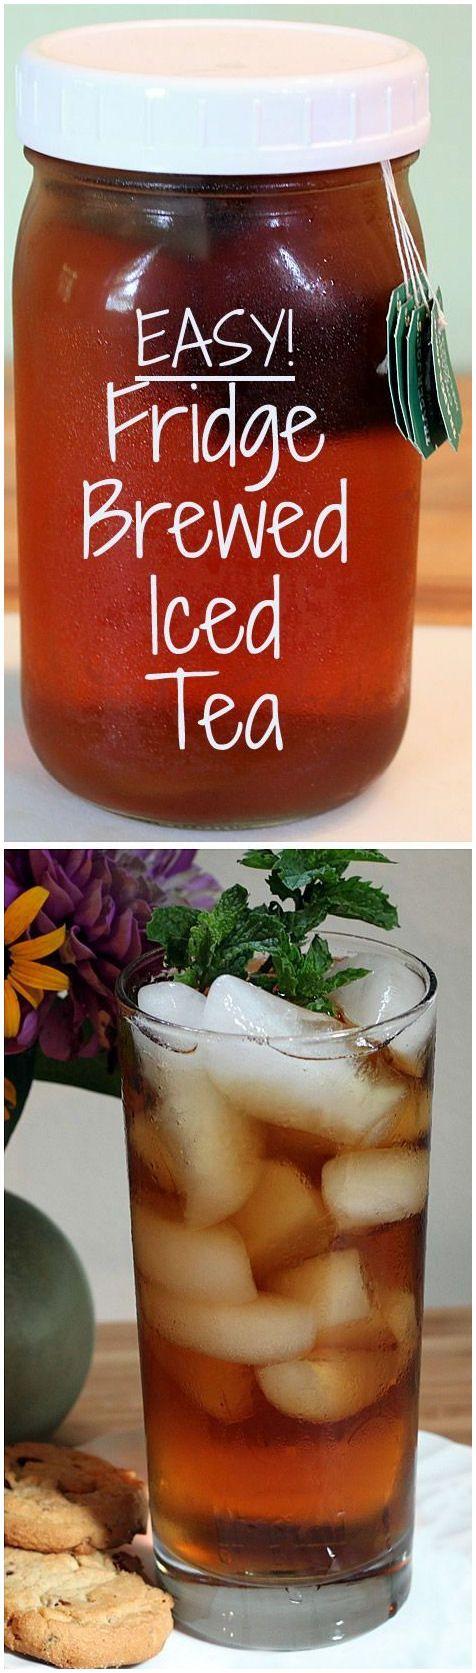 DIY Refrigerator Iced Tea // no boiling, easy & healthy #energy